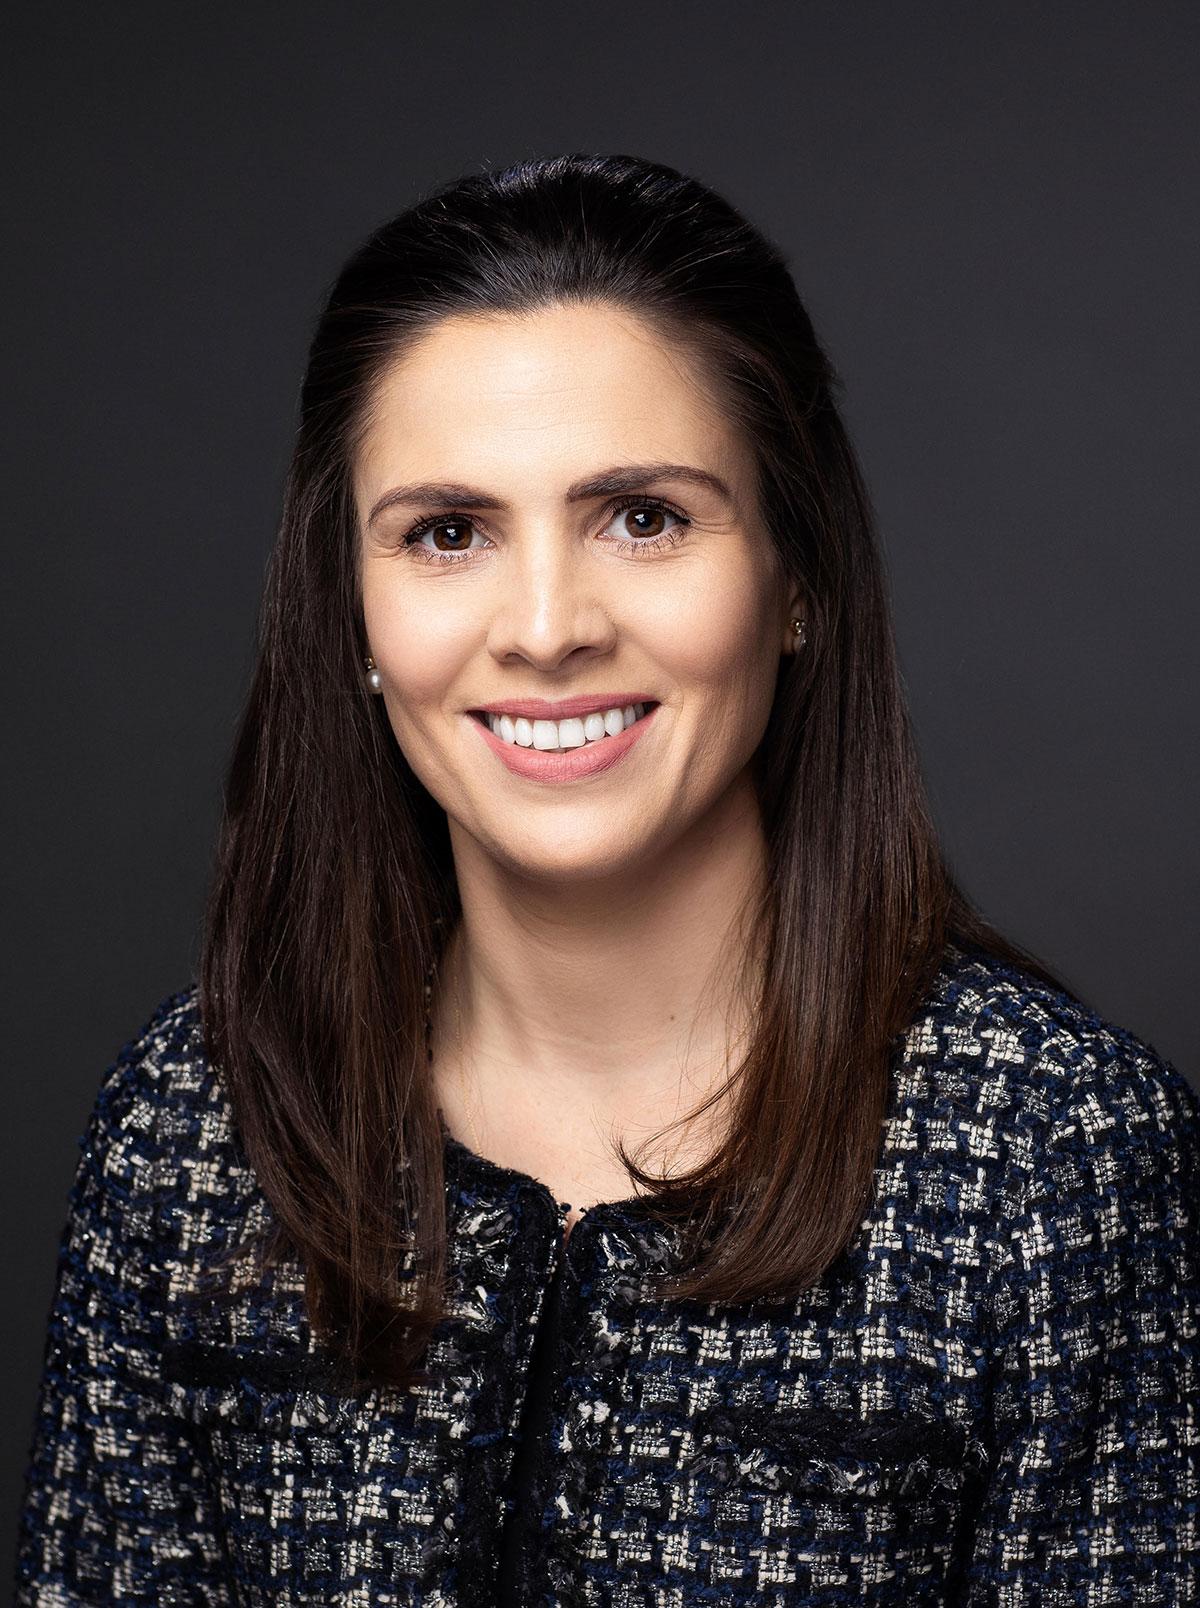 Dr. Catherine Foley